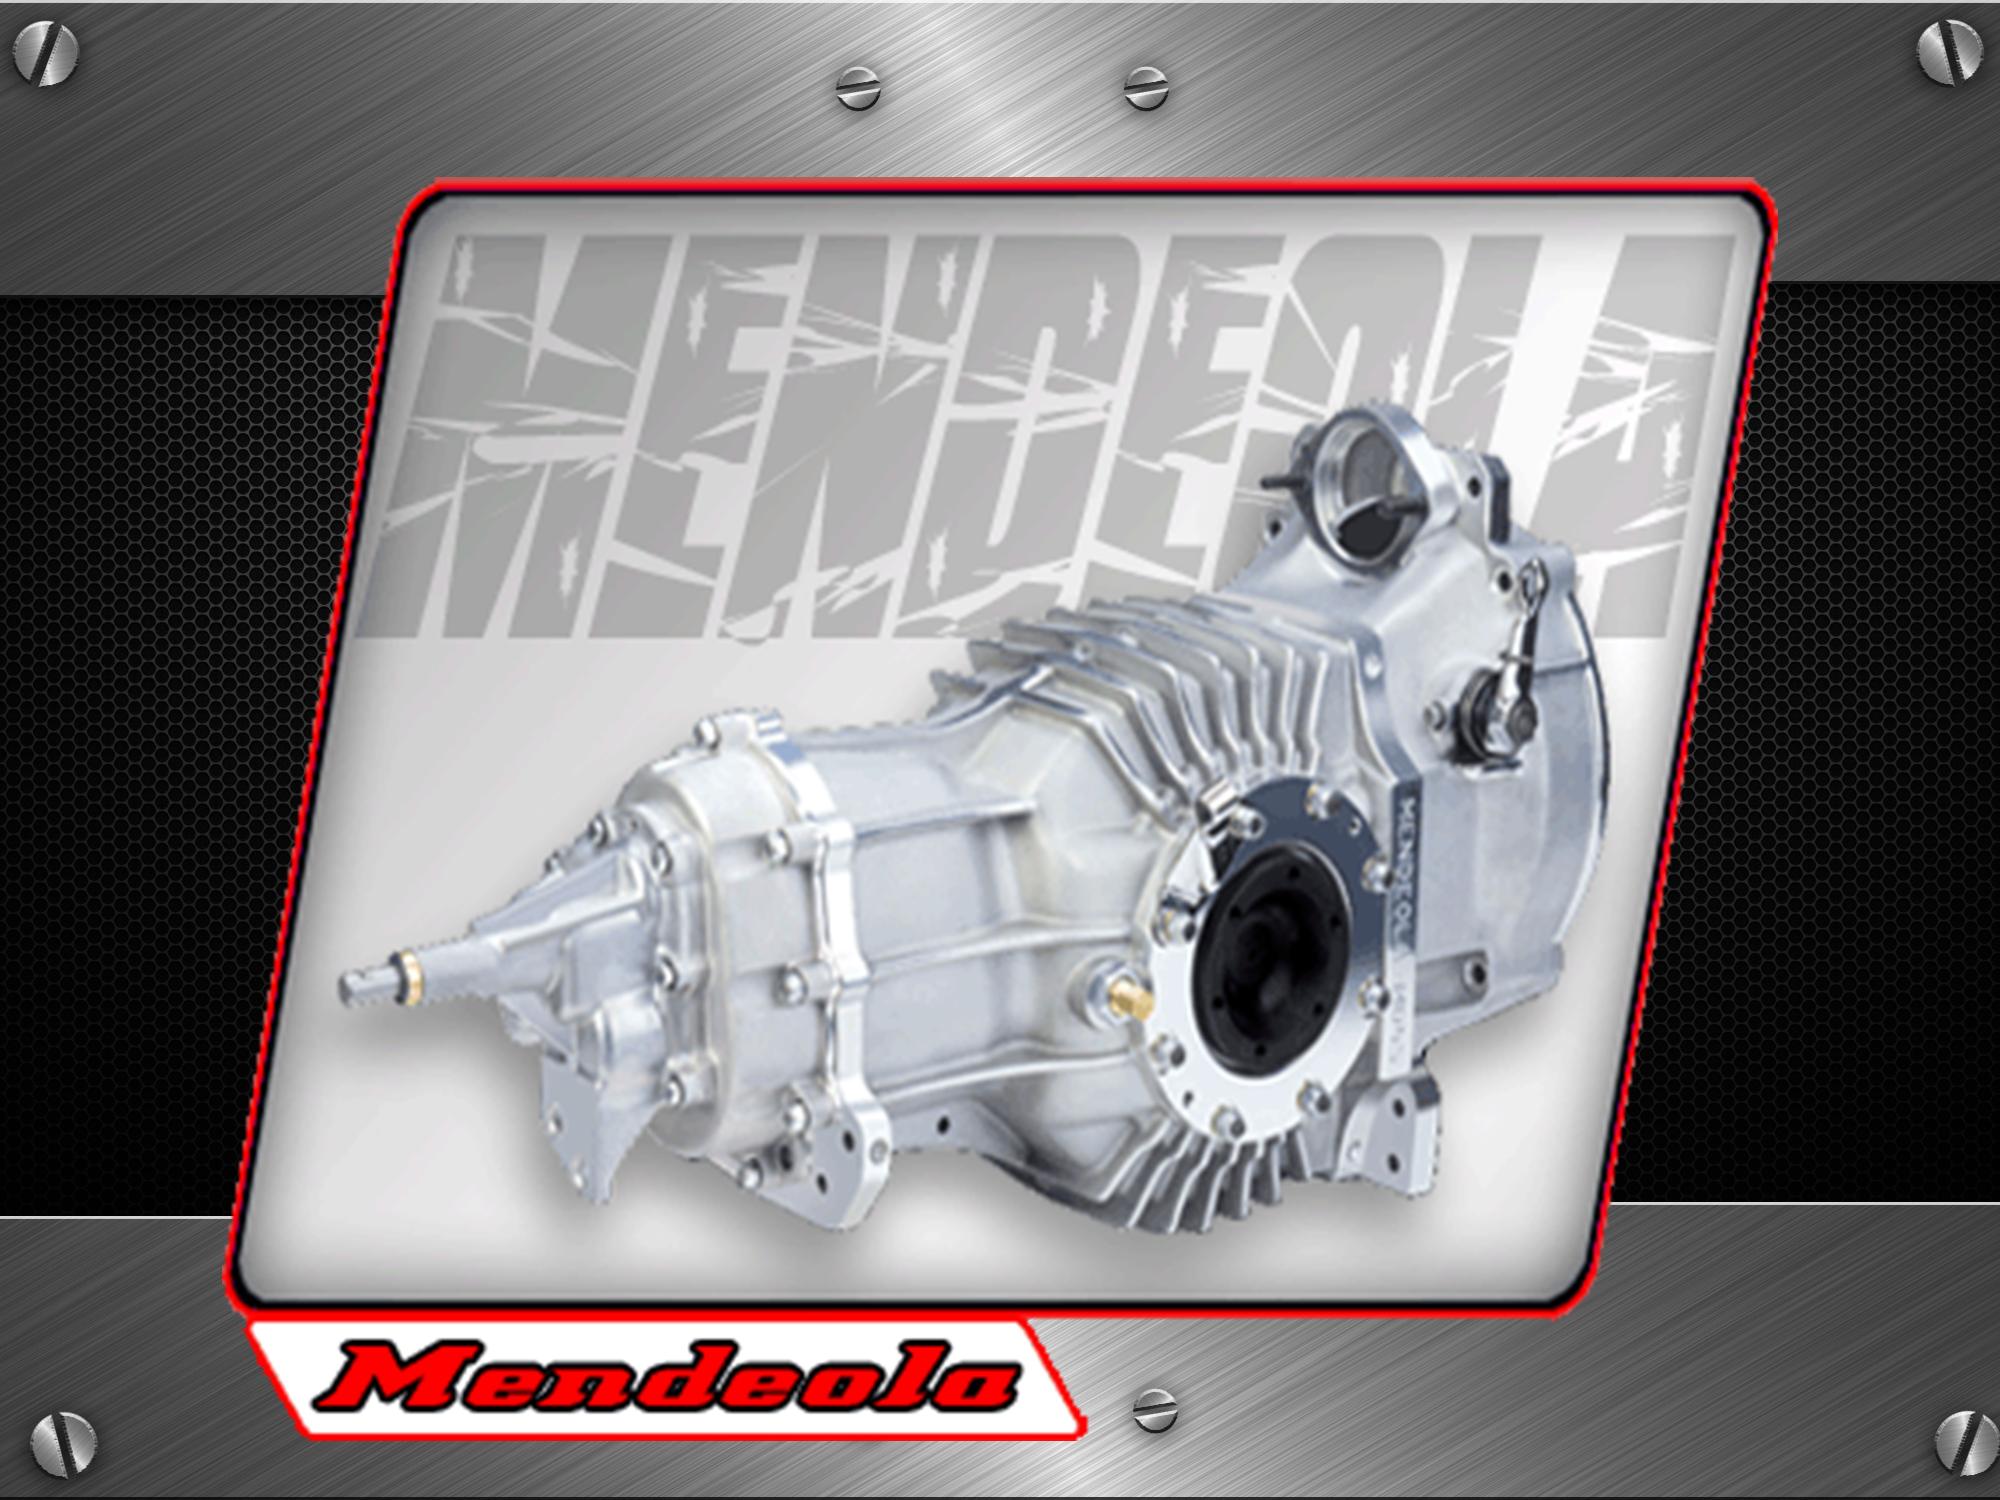 Mendeola transmissions wright gear box